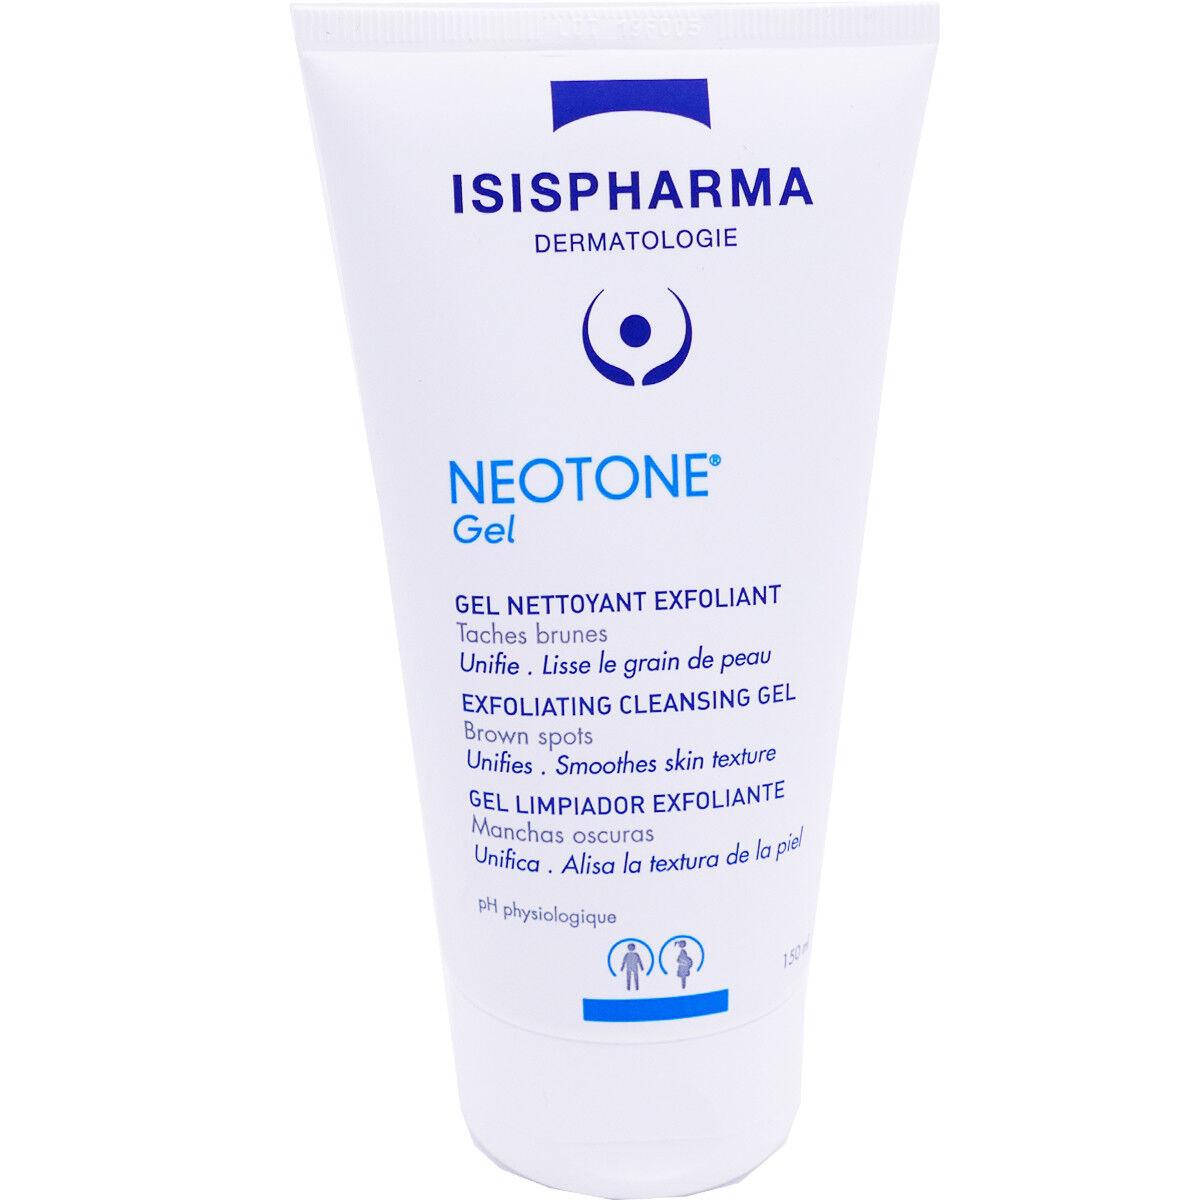 Isispharma neotone gel nettoyant exfoliant 150 ml